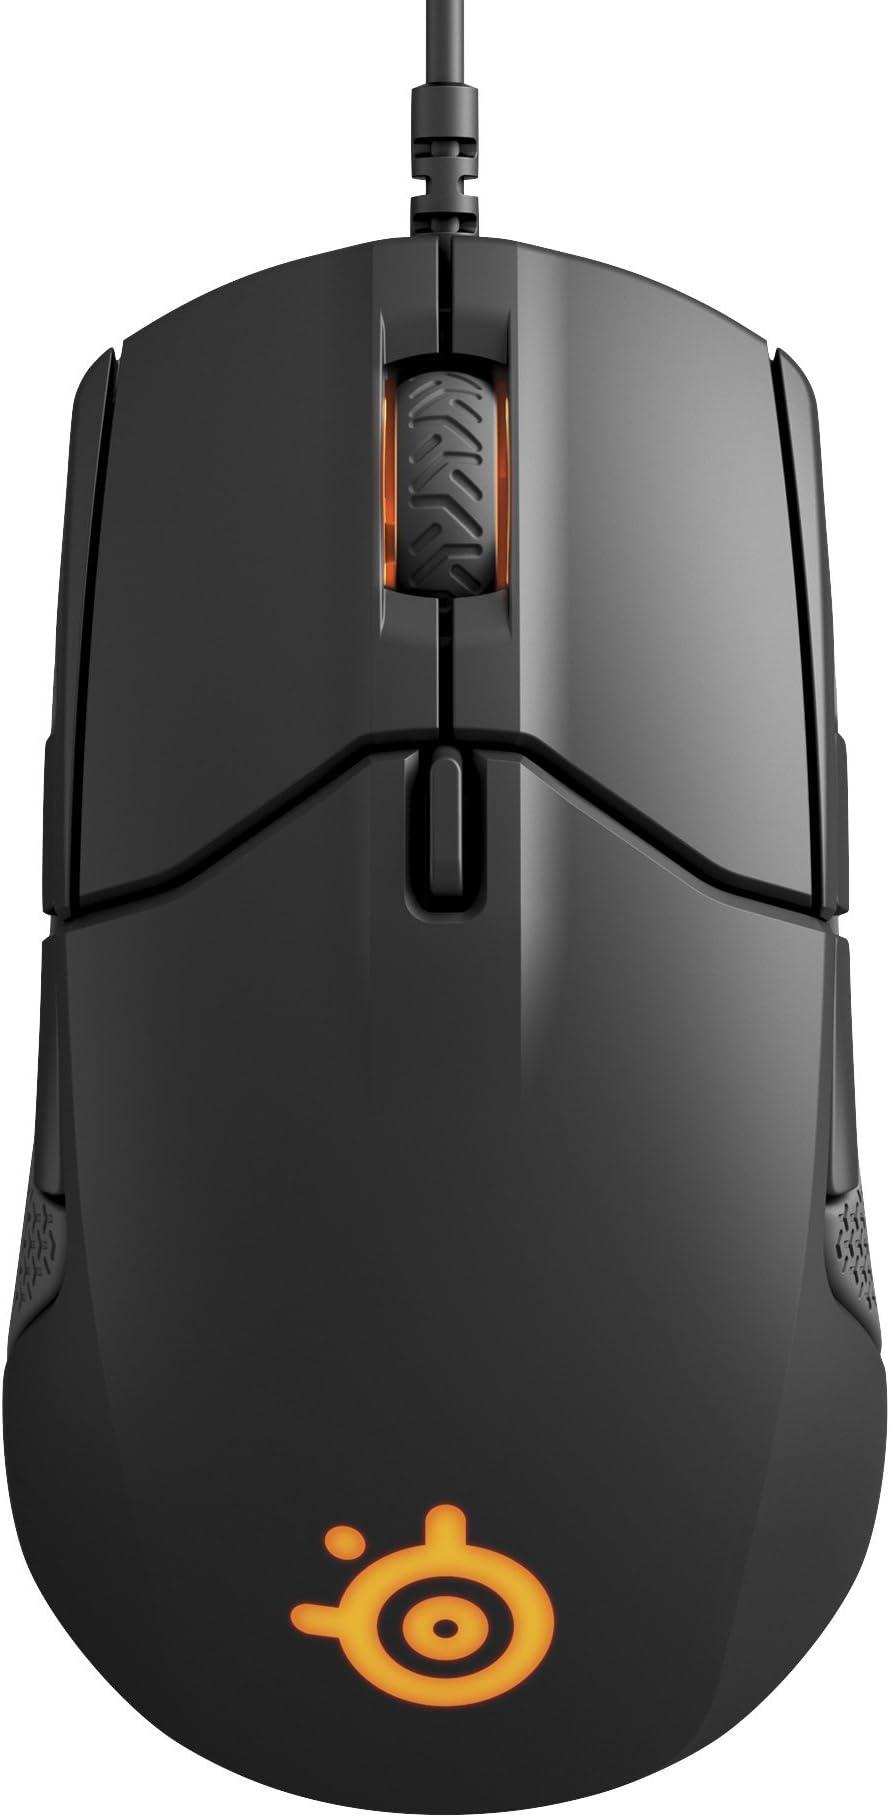 SteelSeries Sensei 310 Gaming Mouse - 12,000 CPI TrueMove3 Optical Sensor - Ambidextrous Design - Split-Trigger Buttons - RGB Lighting, Black